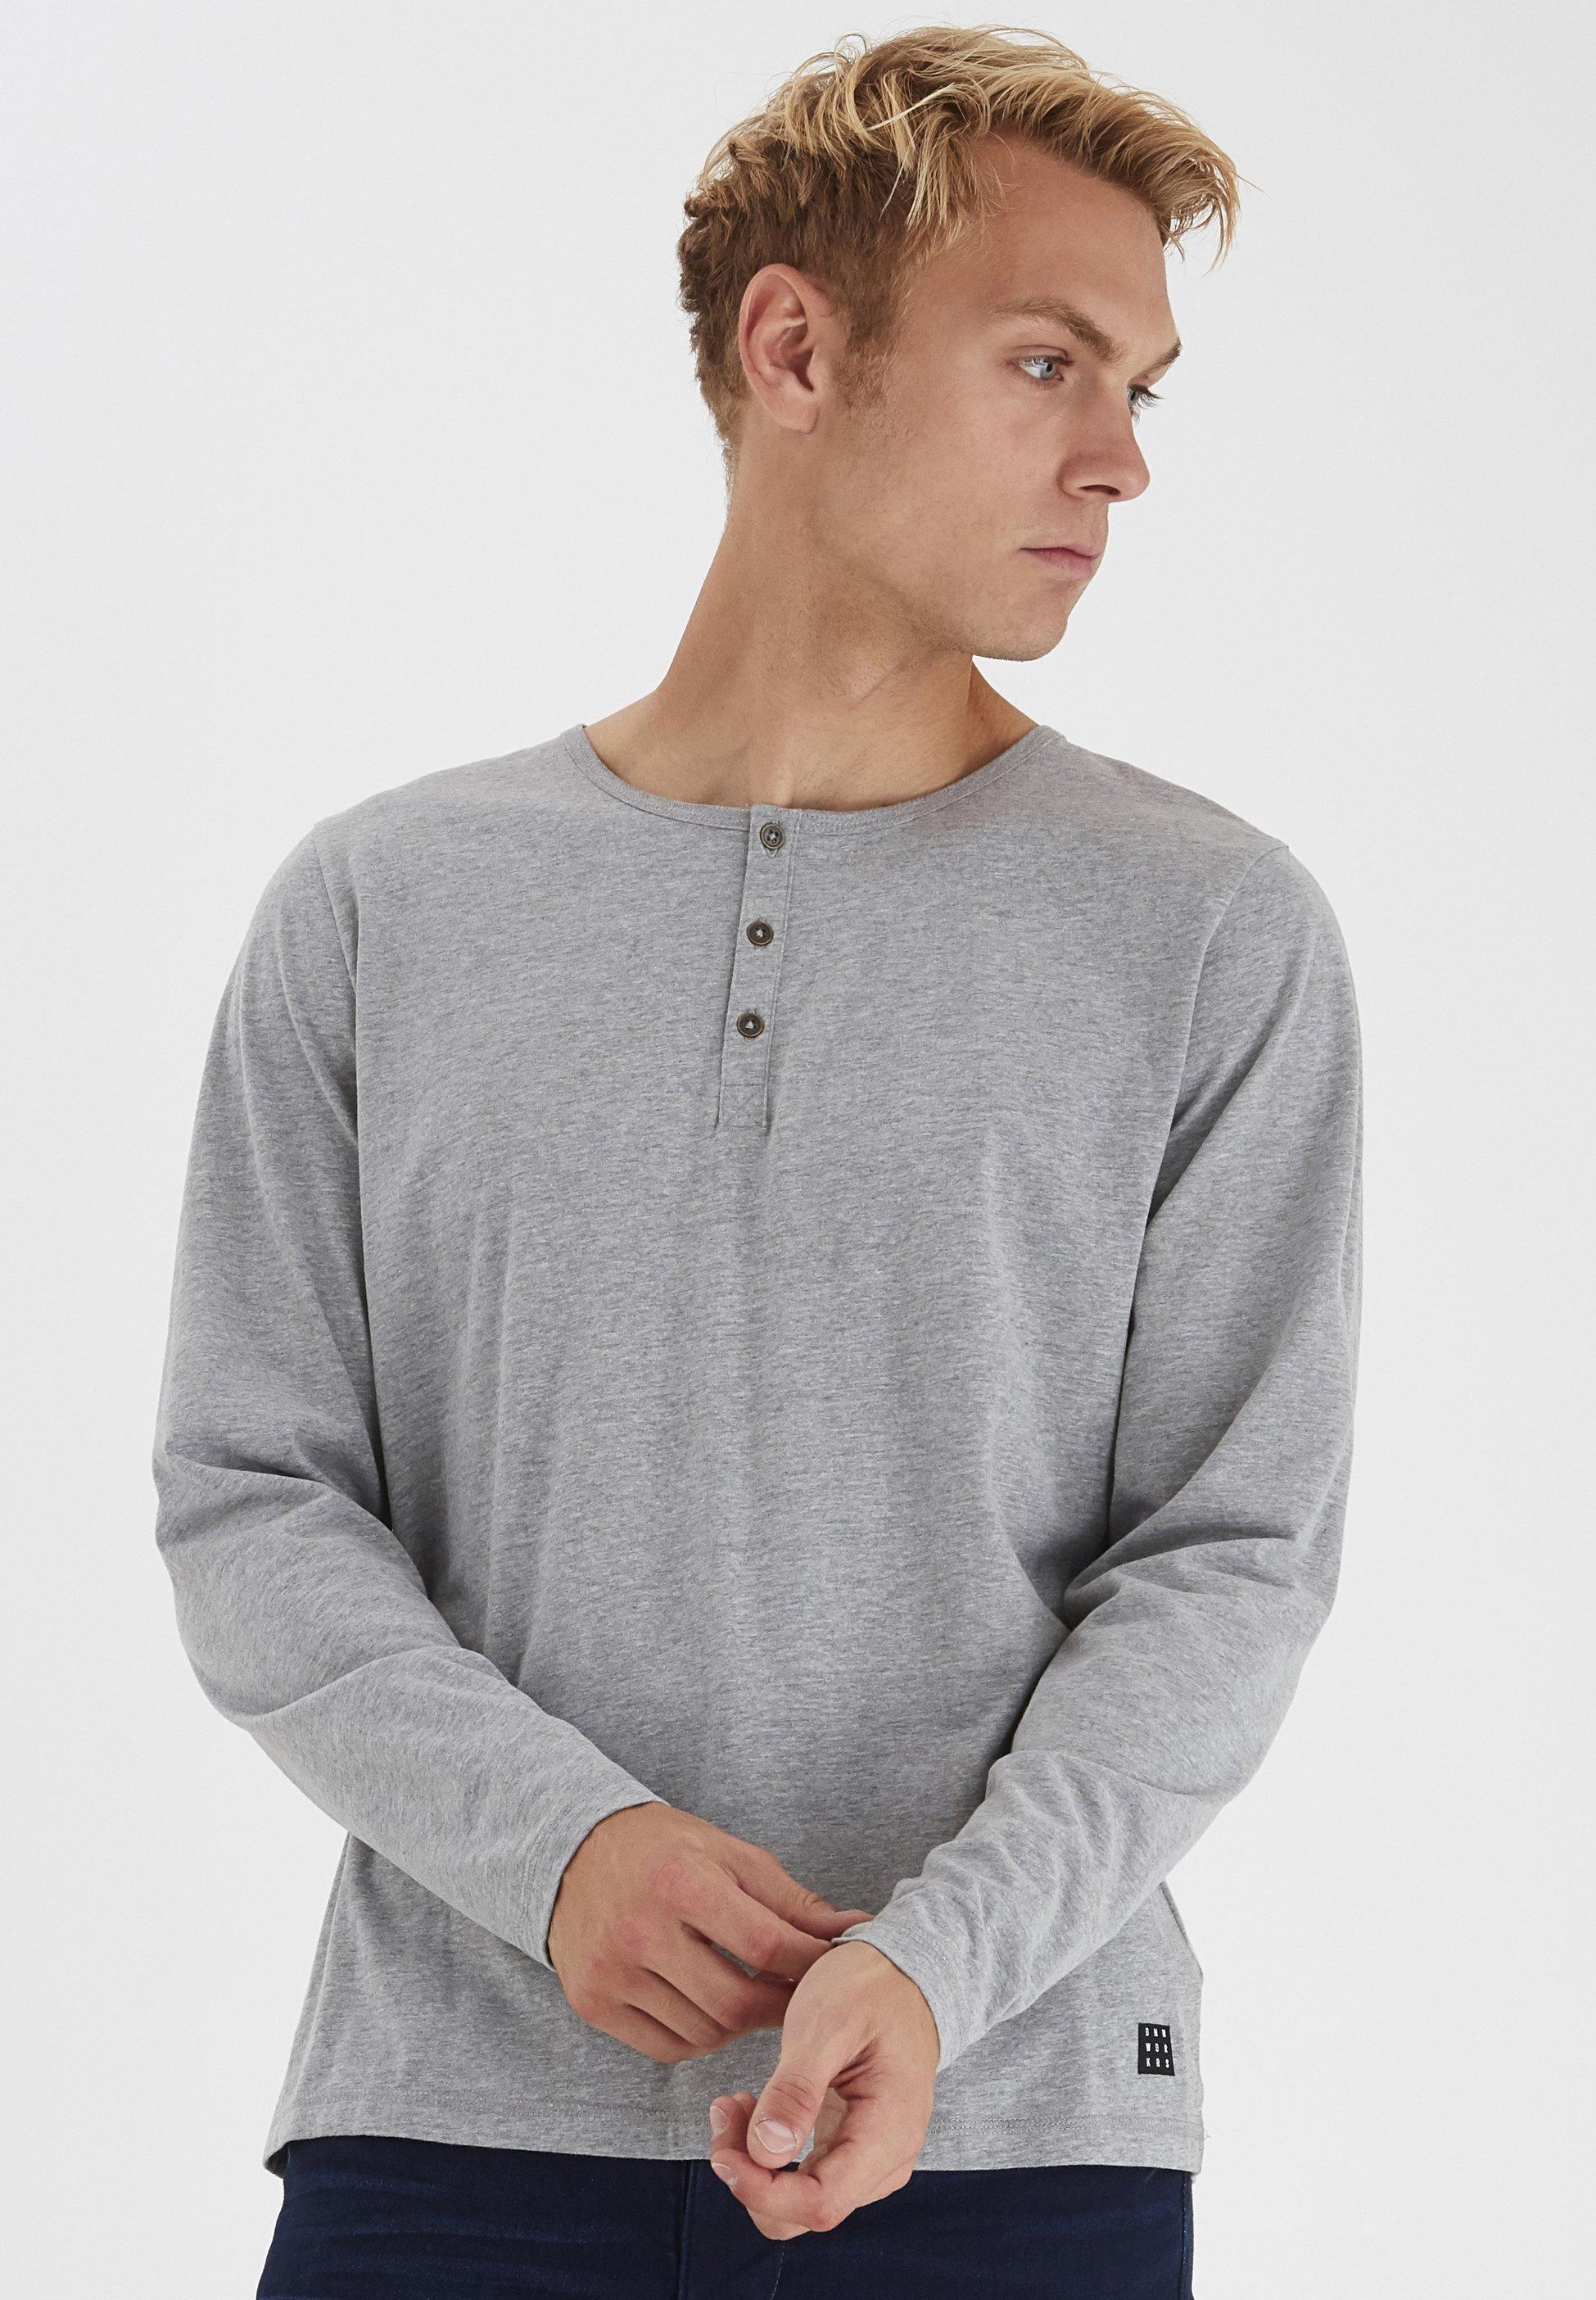 Blend Long sleeved top - stone mix RdOW1